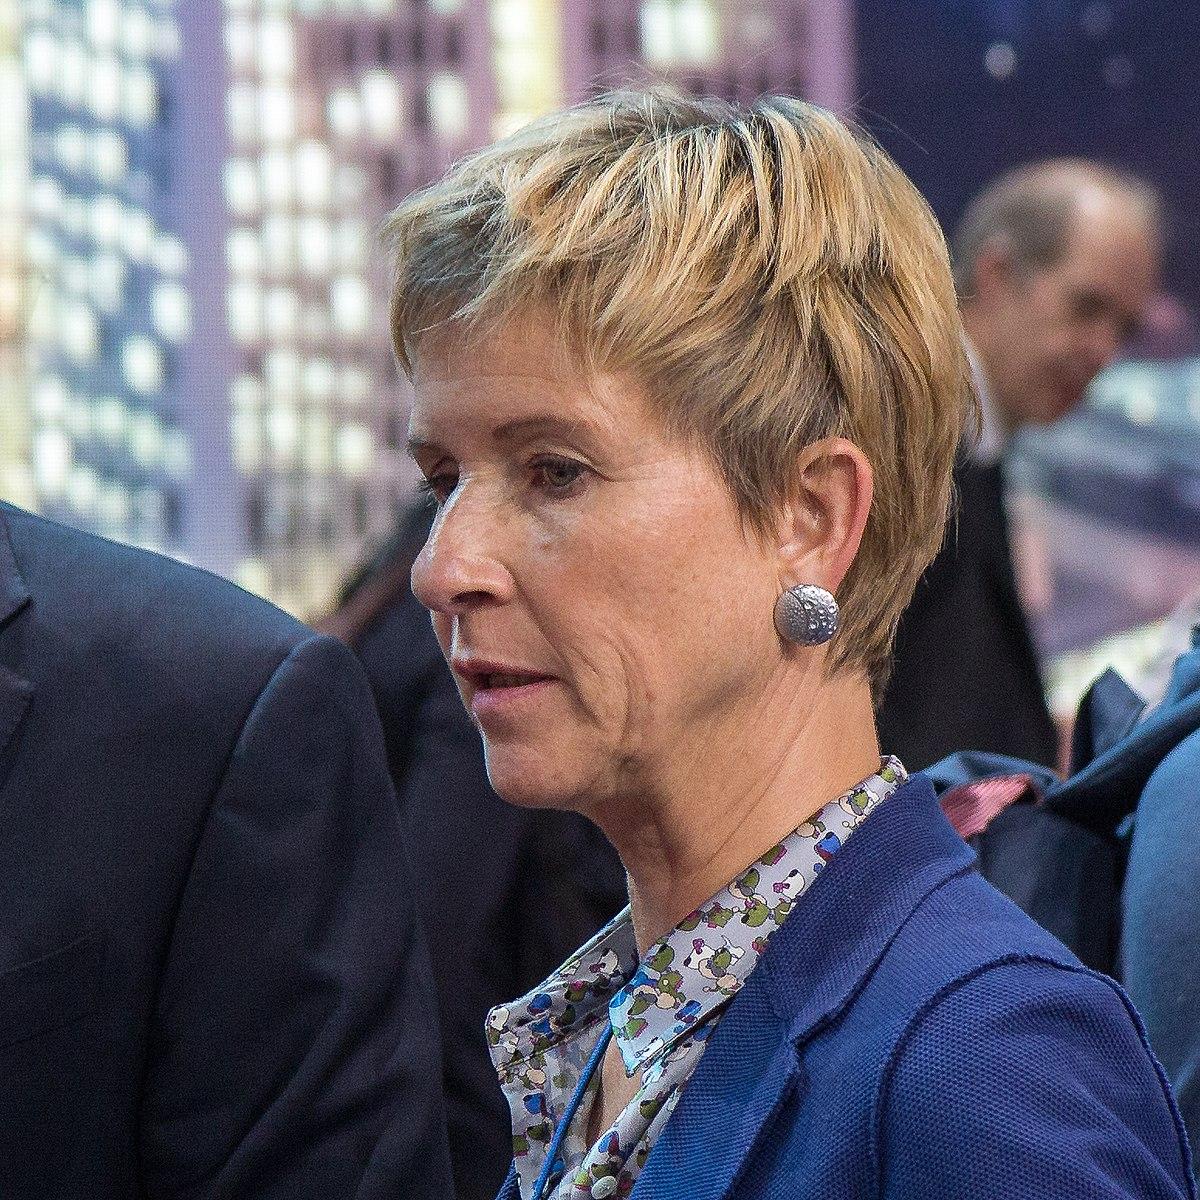 Susanne Klatten Jung